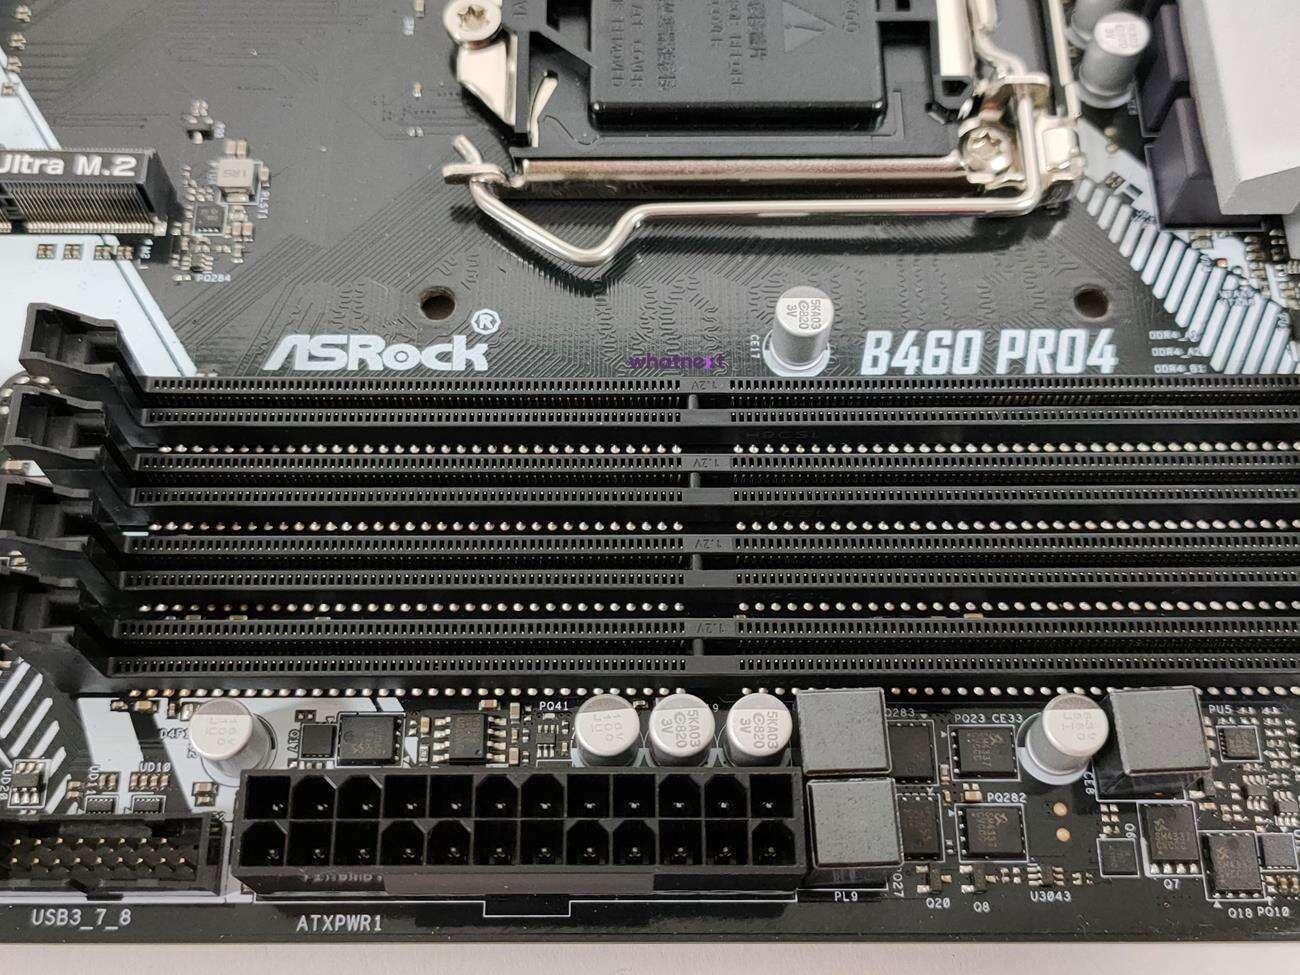 test ASRock B460 Pro4, recenzja ASRock B460 Pro4, review ASRock B460 Pro4, opinia ASRock B460 Pro4